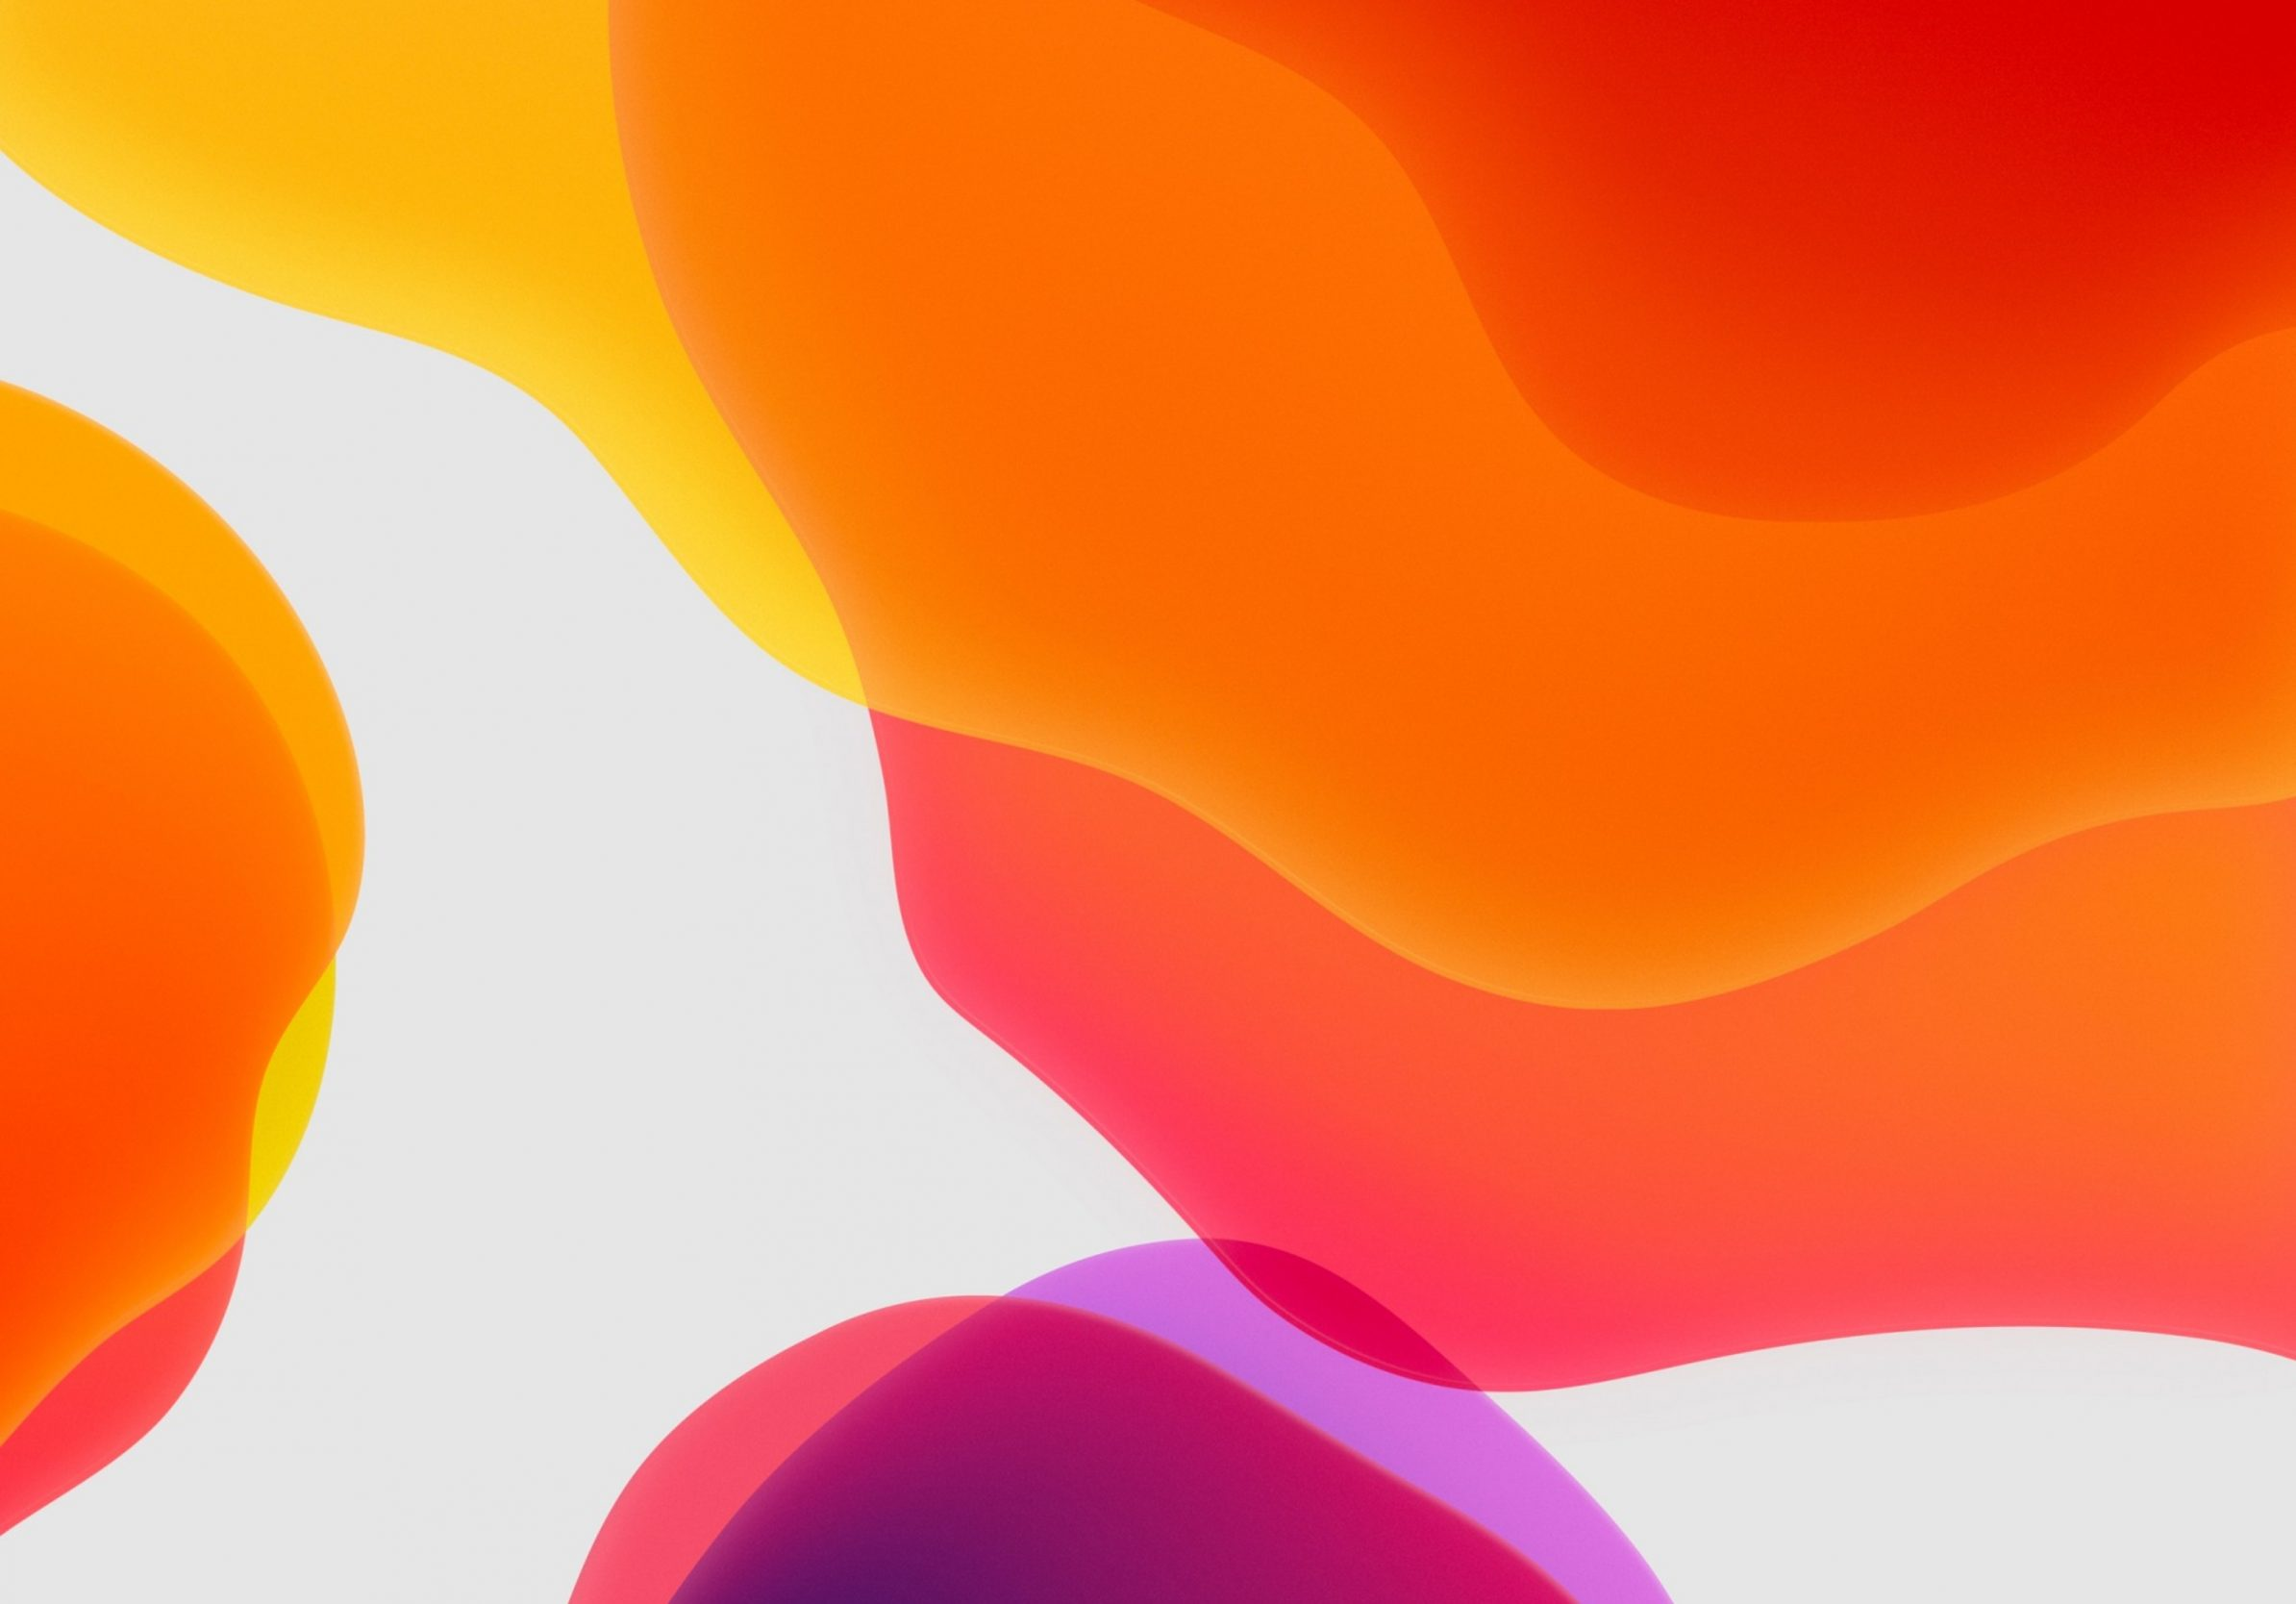 2388x1668 iPad Pro wallpapers Orange Ipados Ipad Wallpaper 2388x1668 pixels resolution